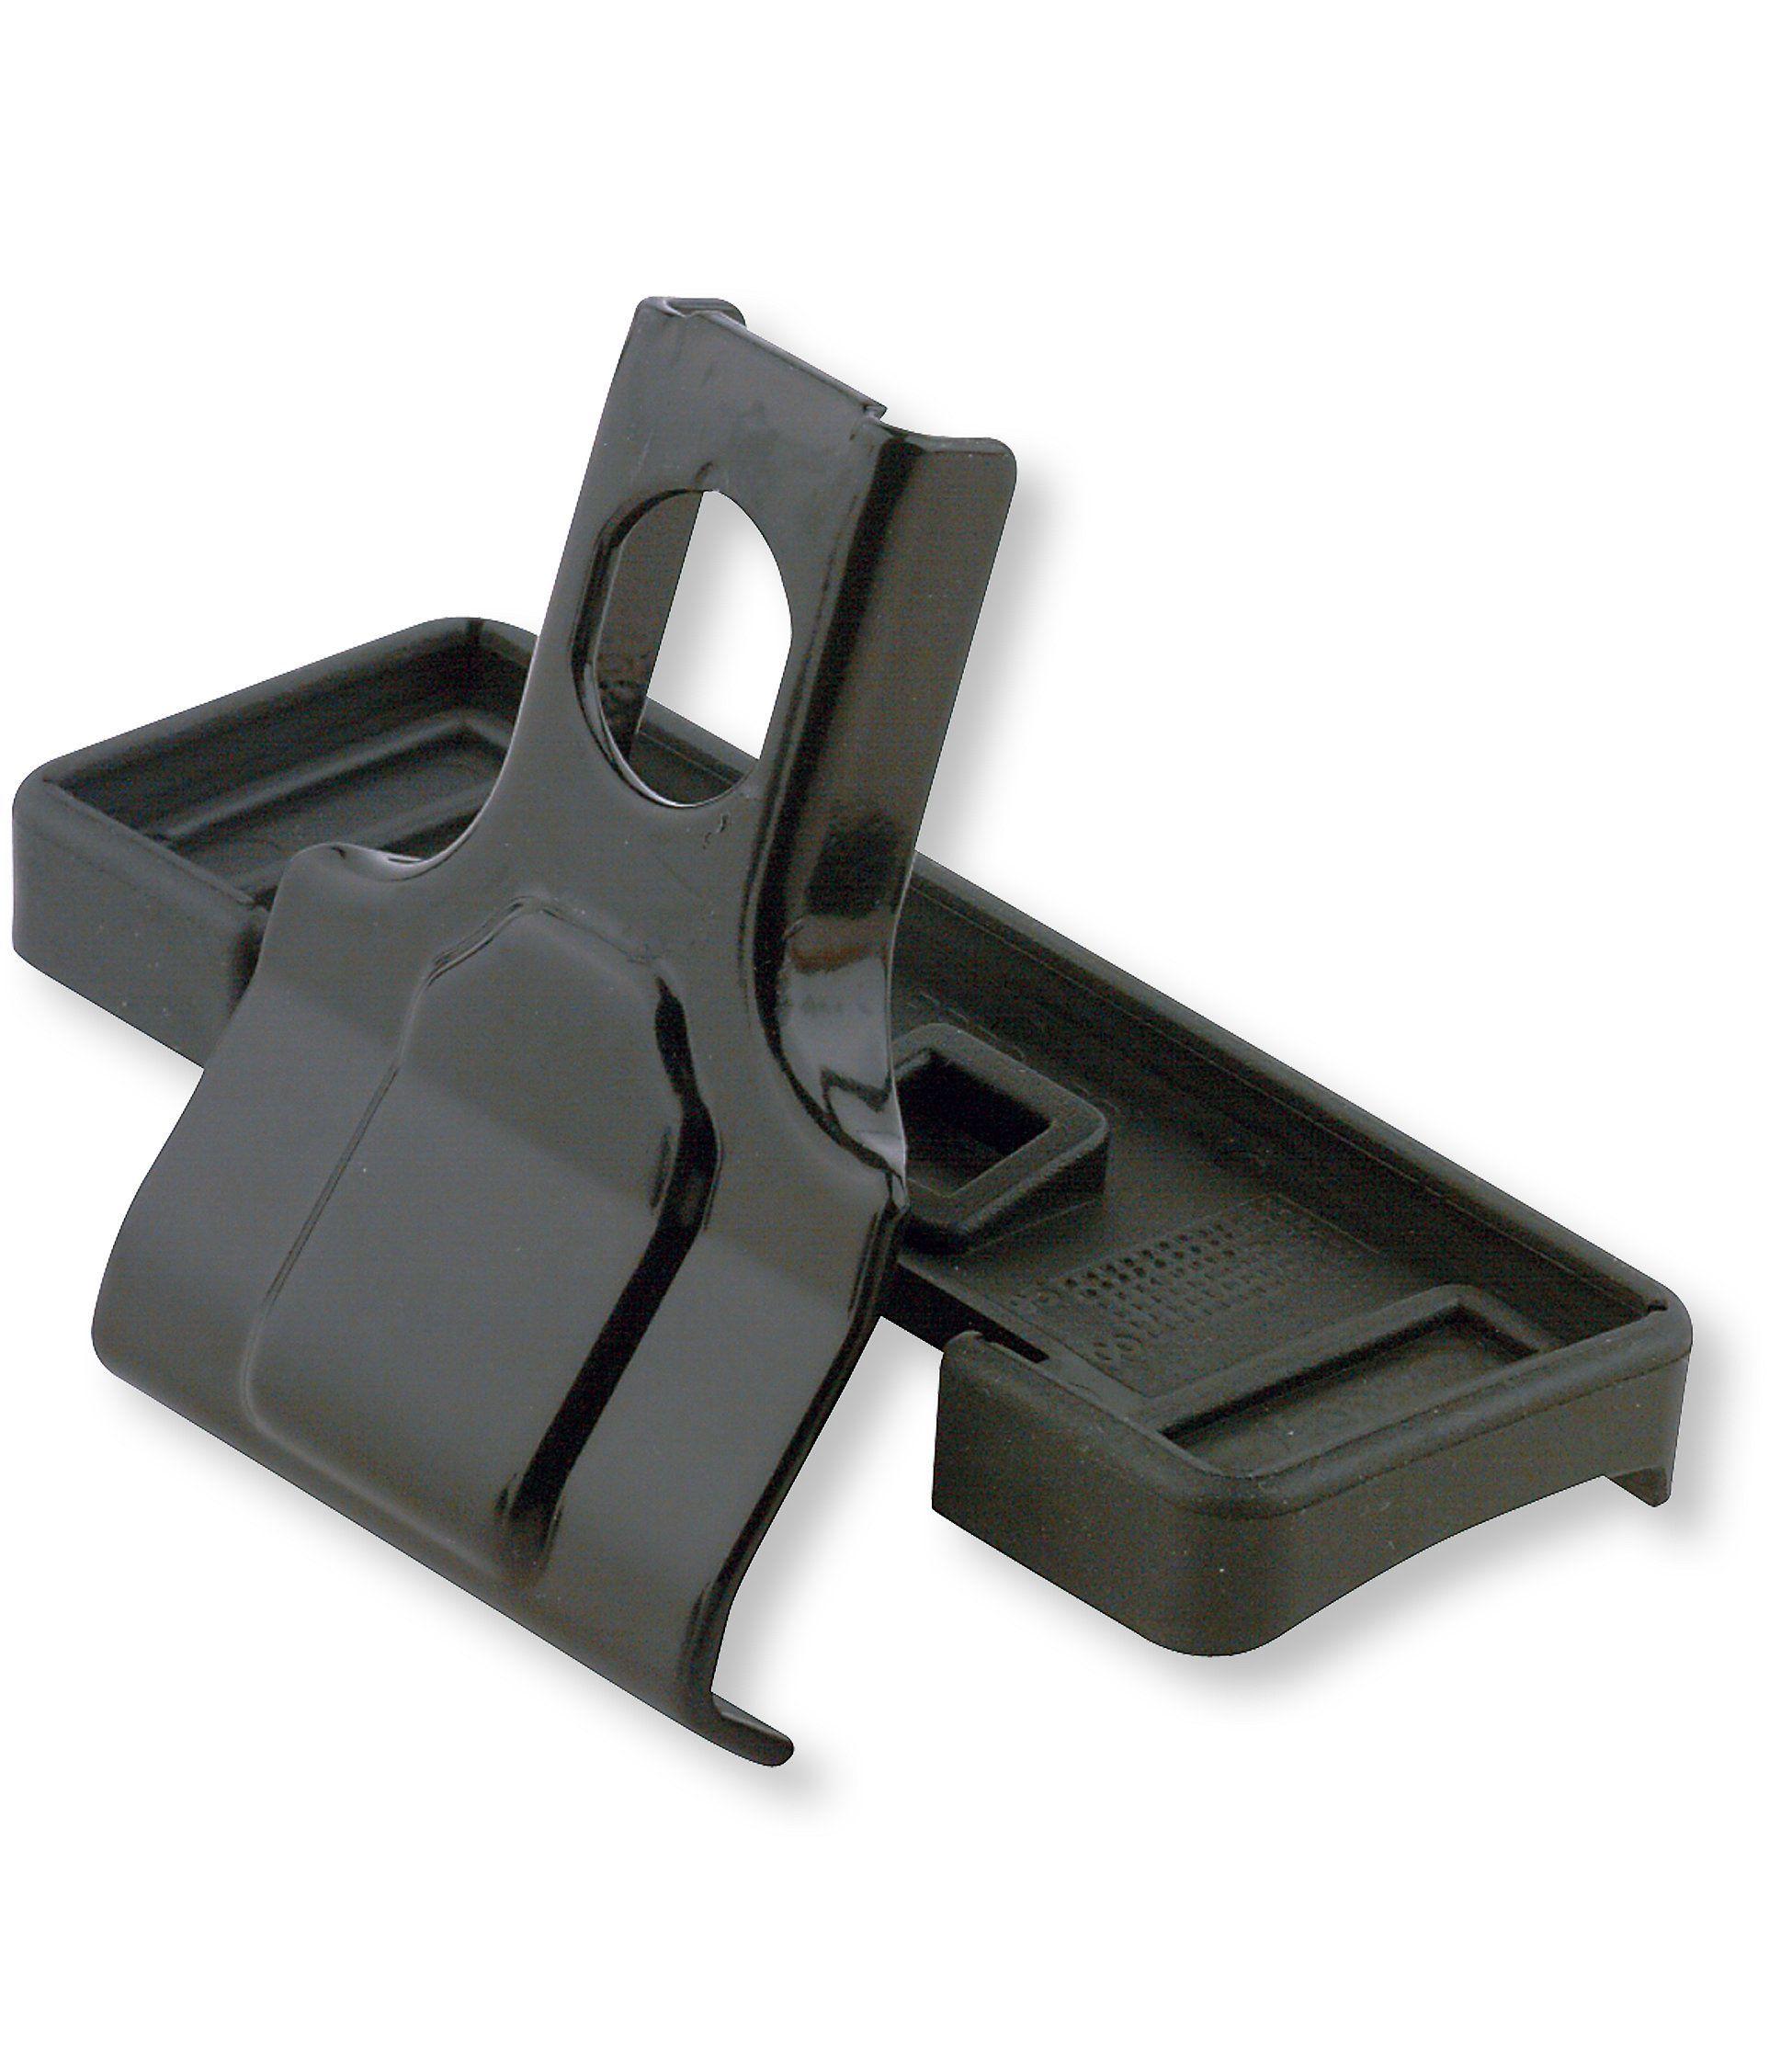 Thule 480 Fit Kit 1500 Roof Rack